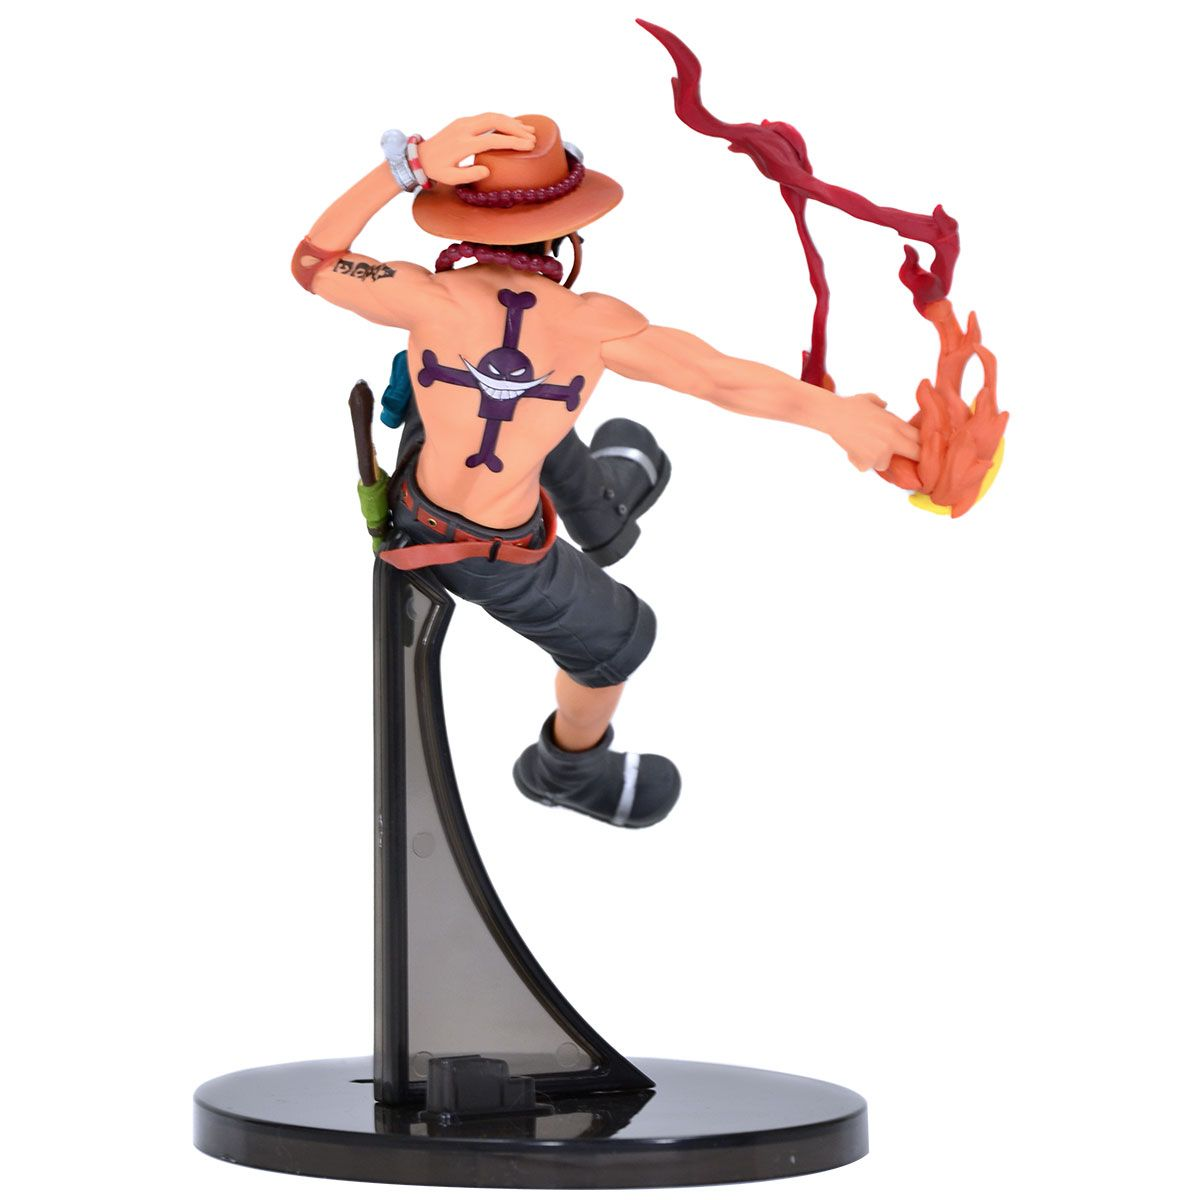 One Piece - Portgas D, Ace - Sculture - Banpresto